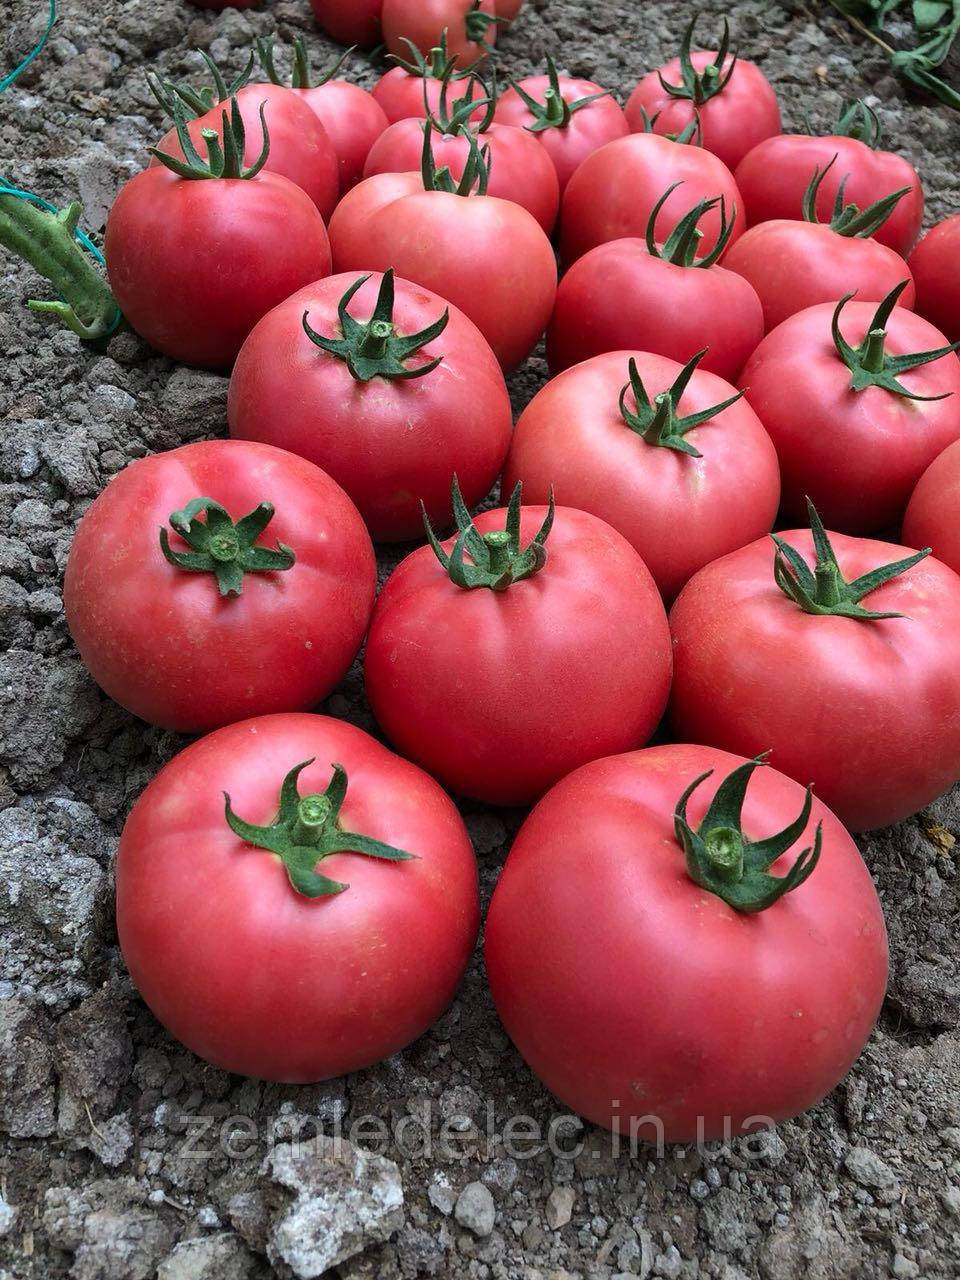 Сим - Сим (777) томат розовый 100 сем. Ерсте Заден